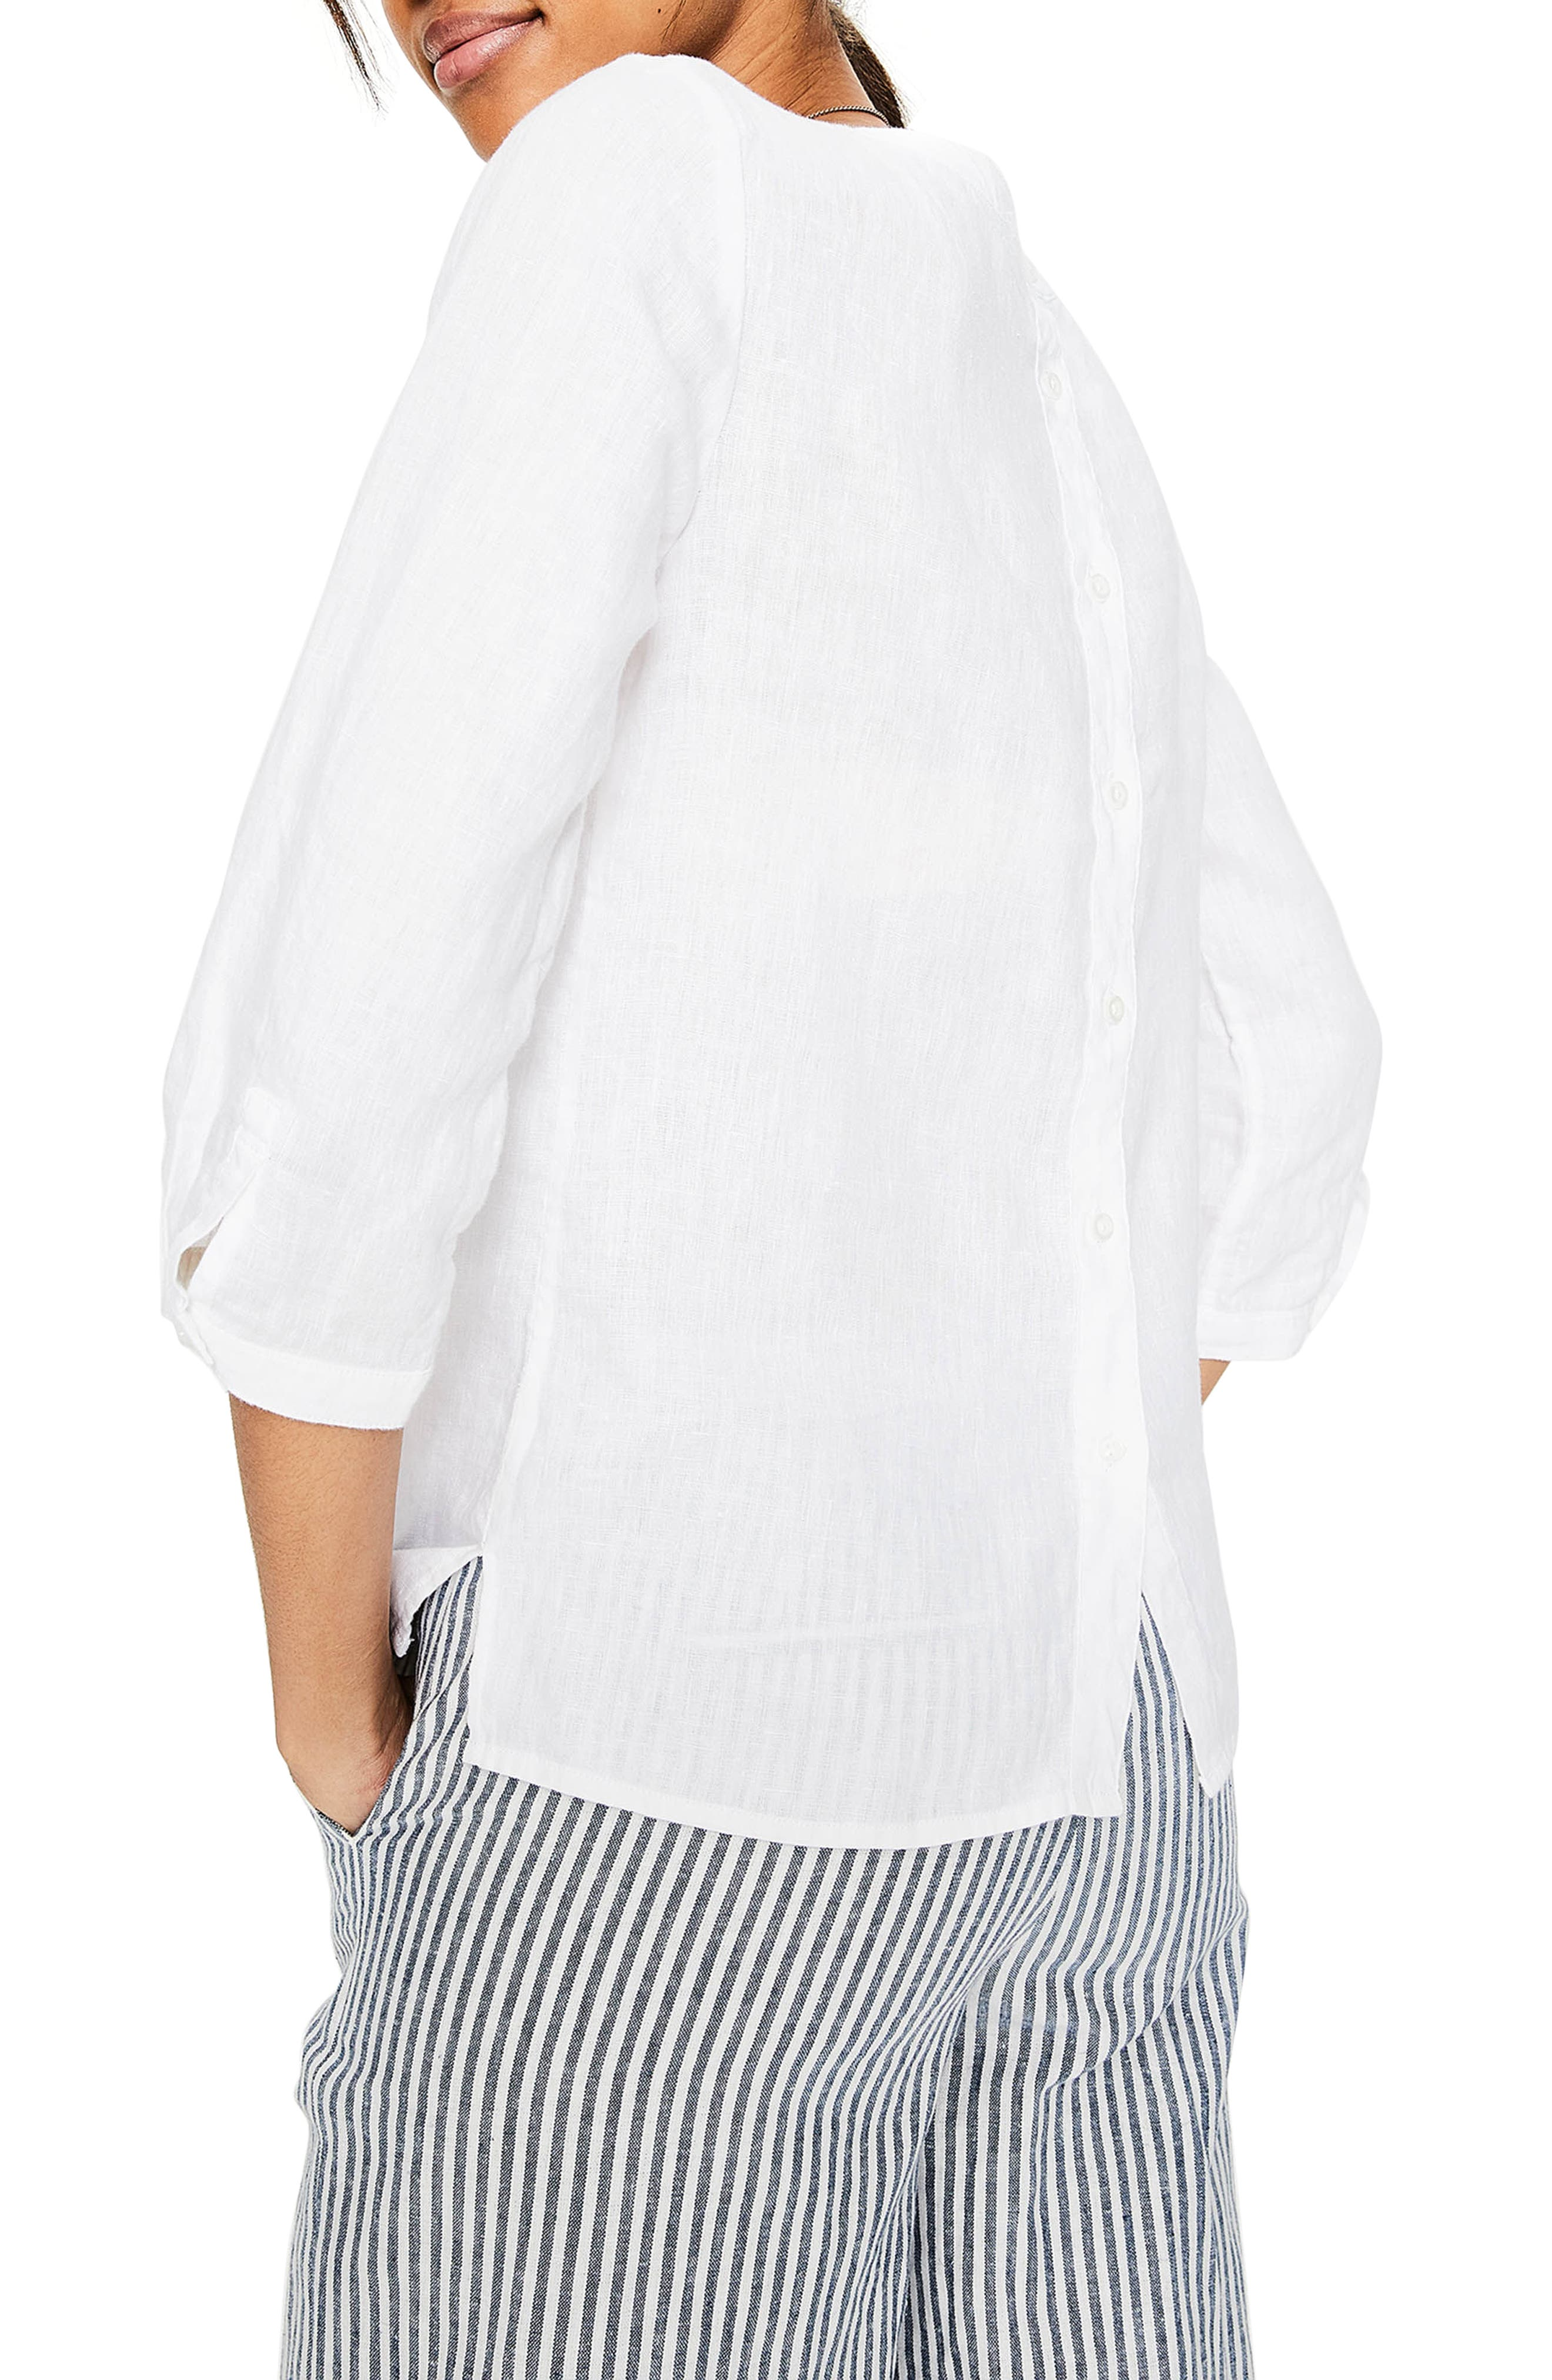 Katie Striped Linen Peasant Top,                             Alternate thumbnail 2, color,                             White